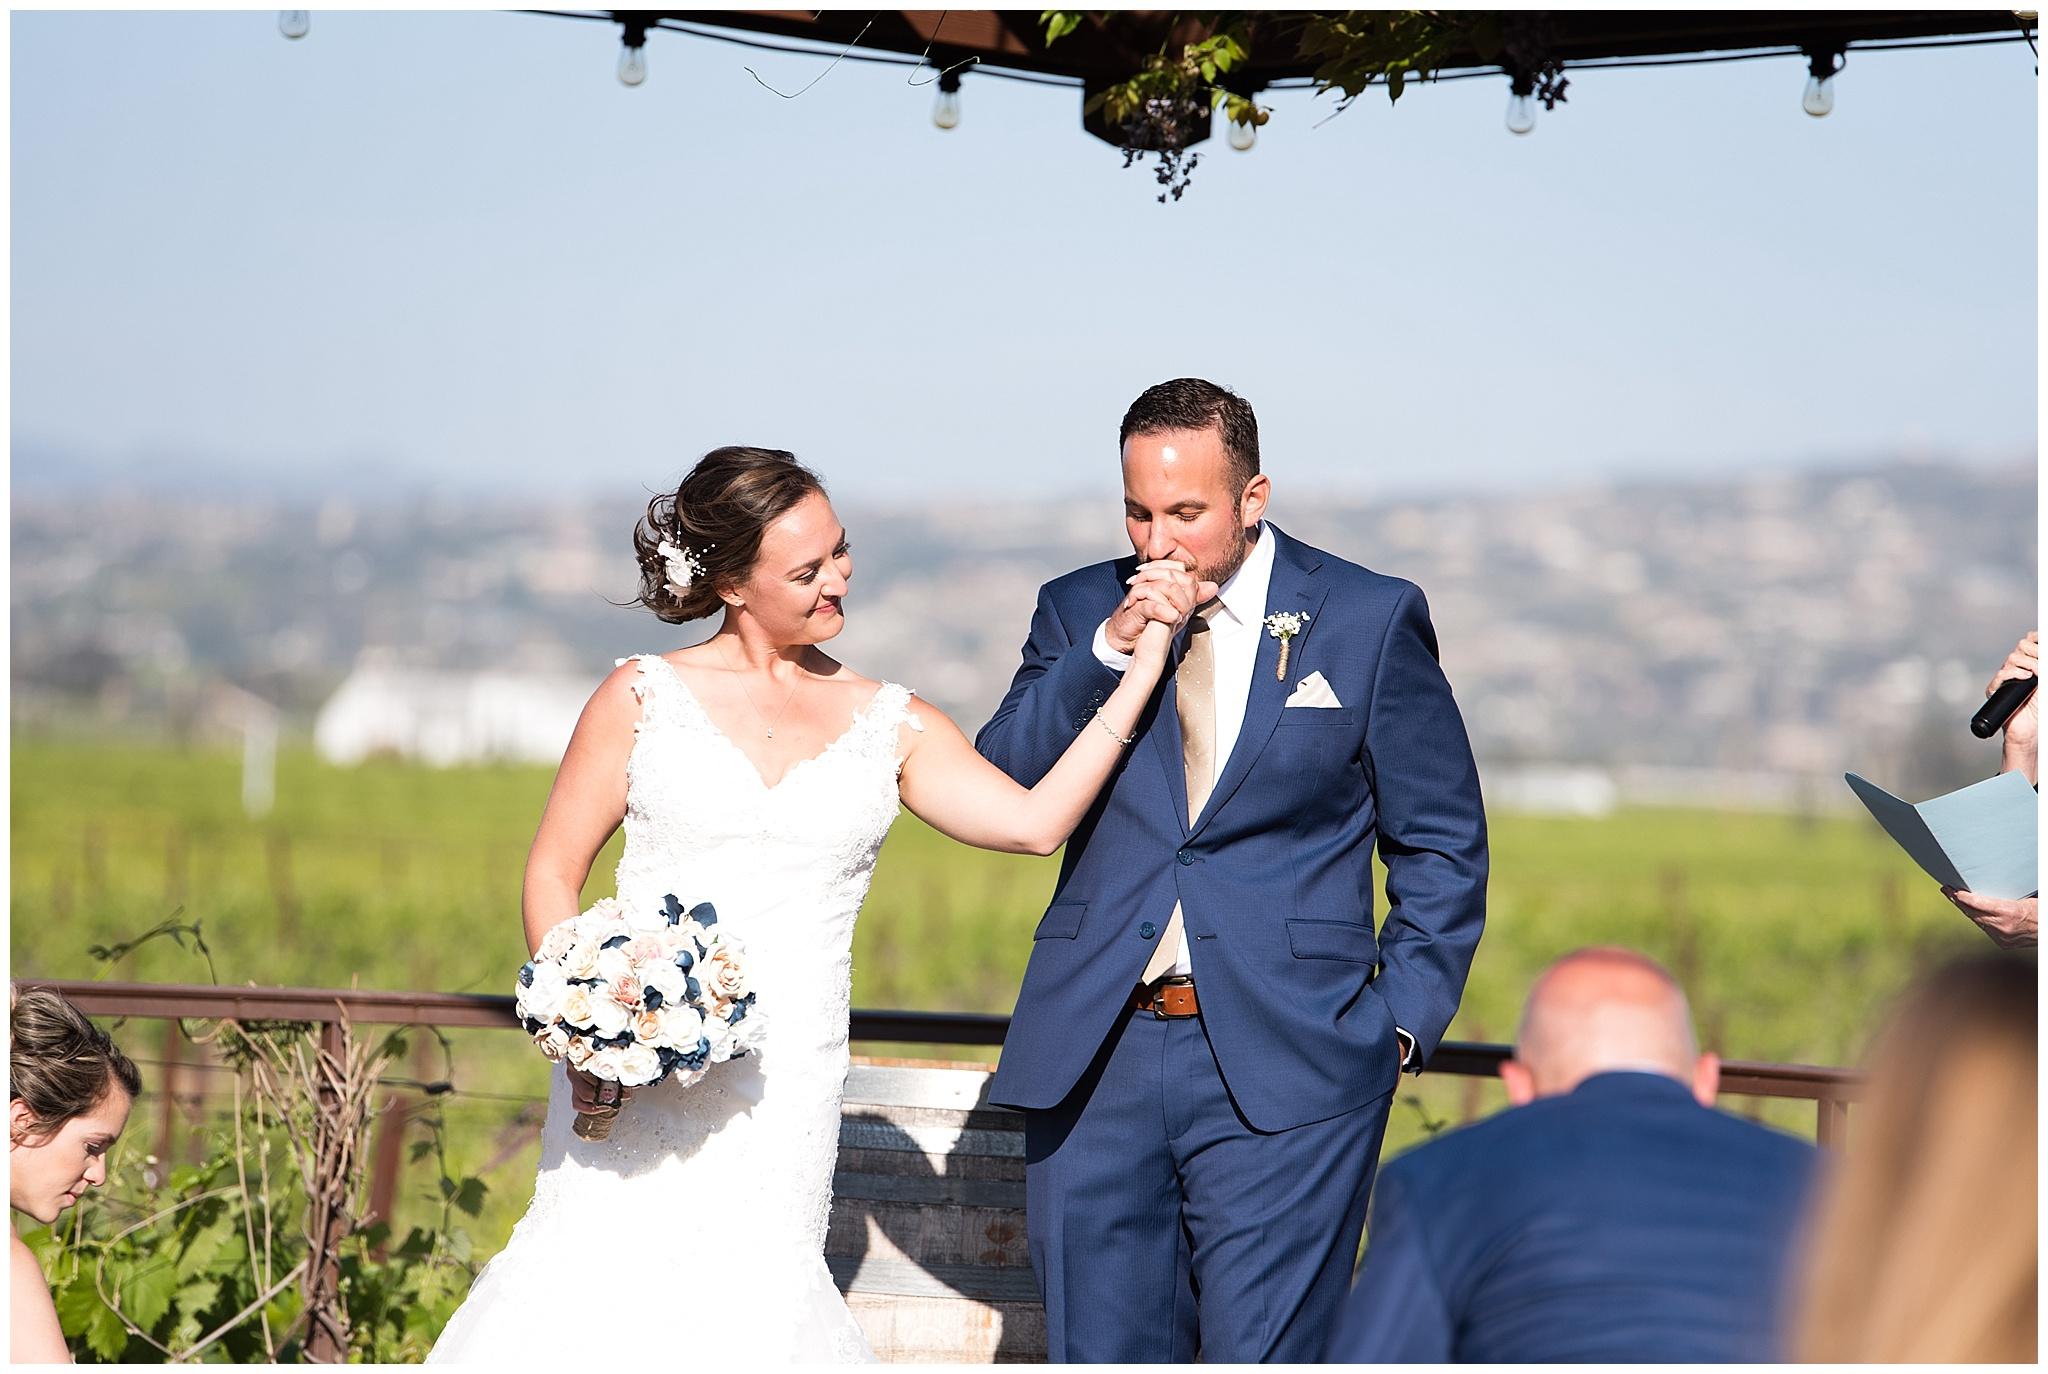 Vinny-Cayt-Wedding-4-26-18-2442-1.jpg